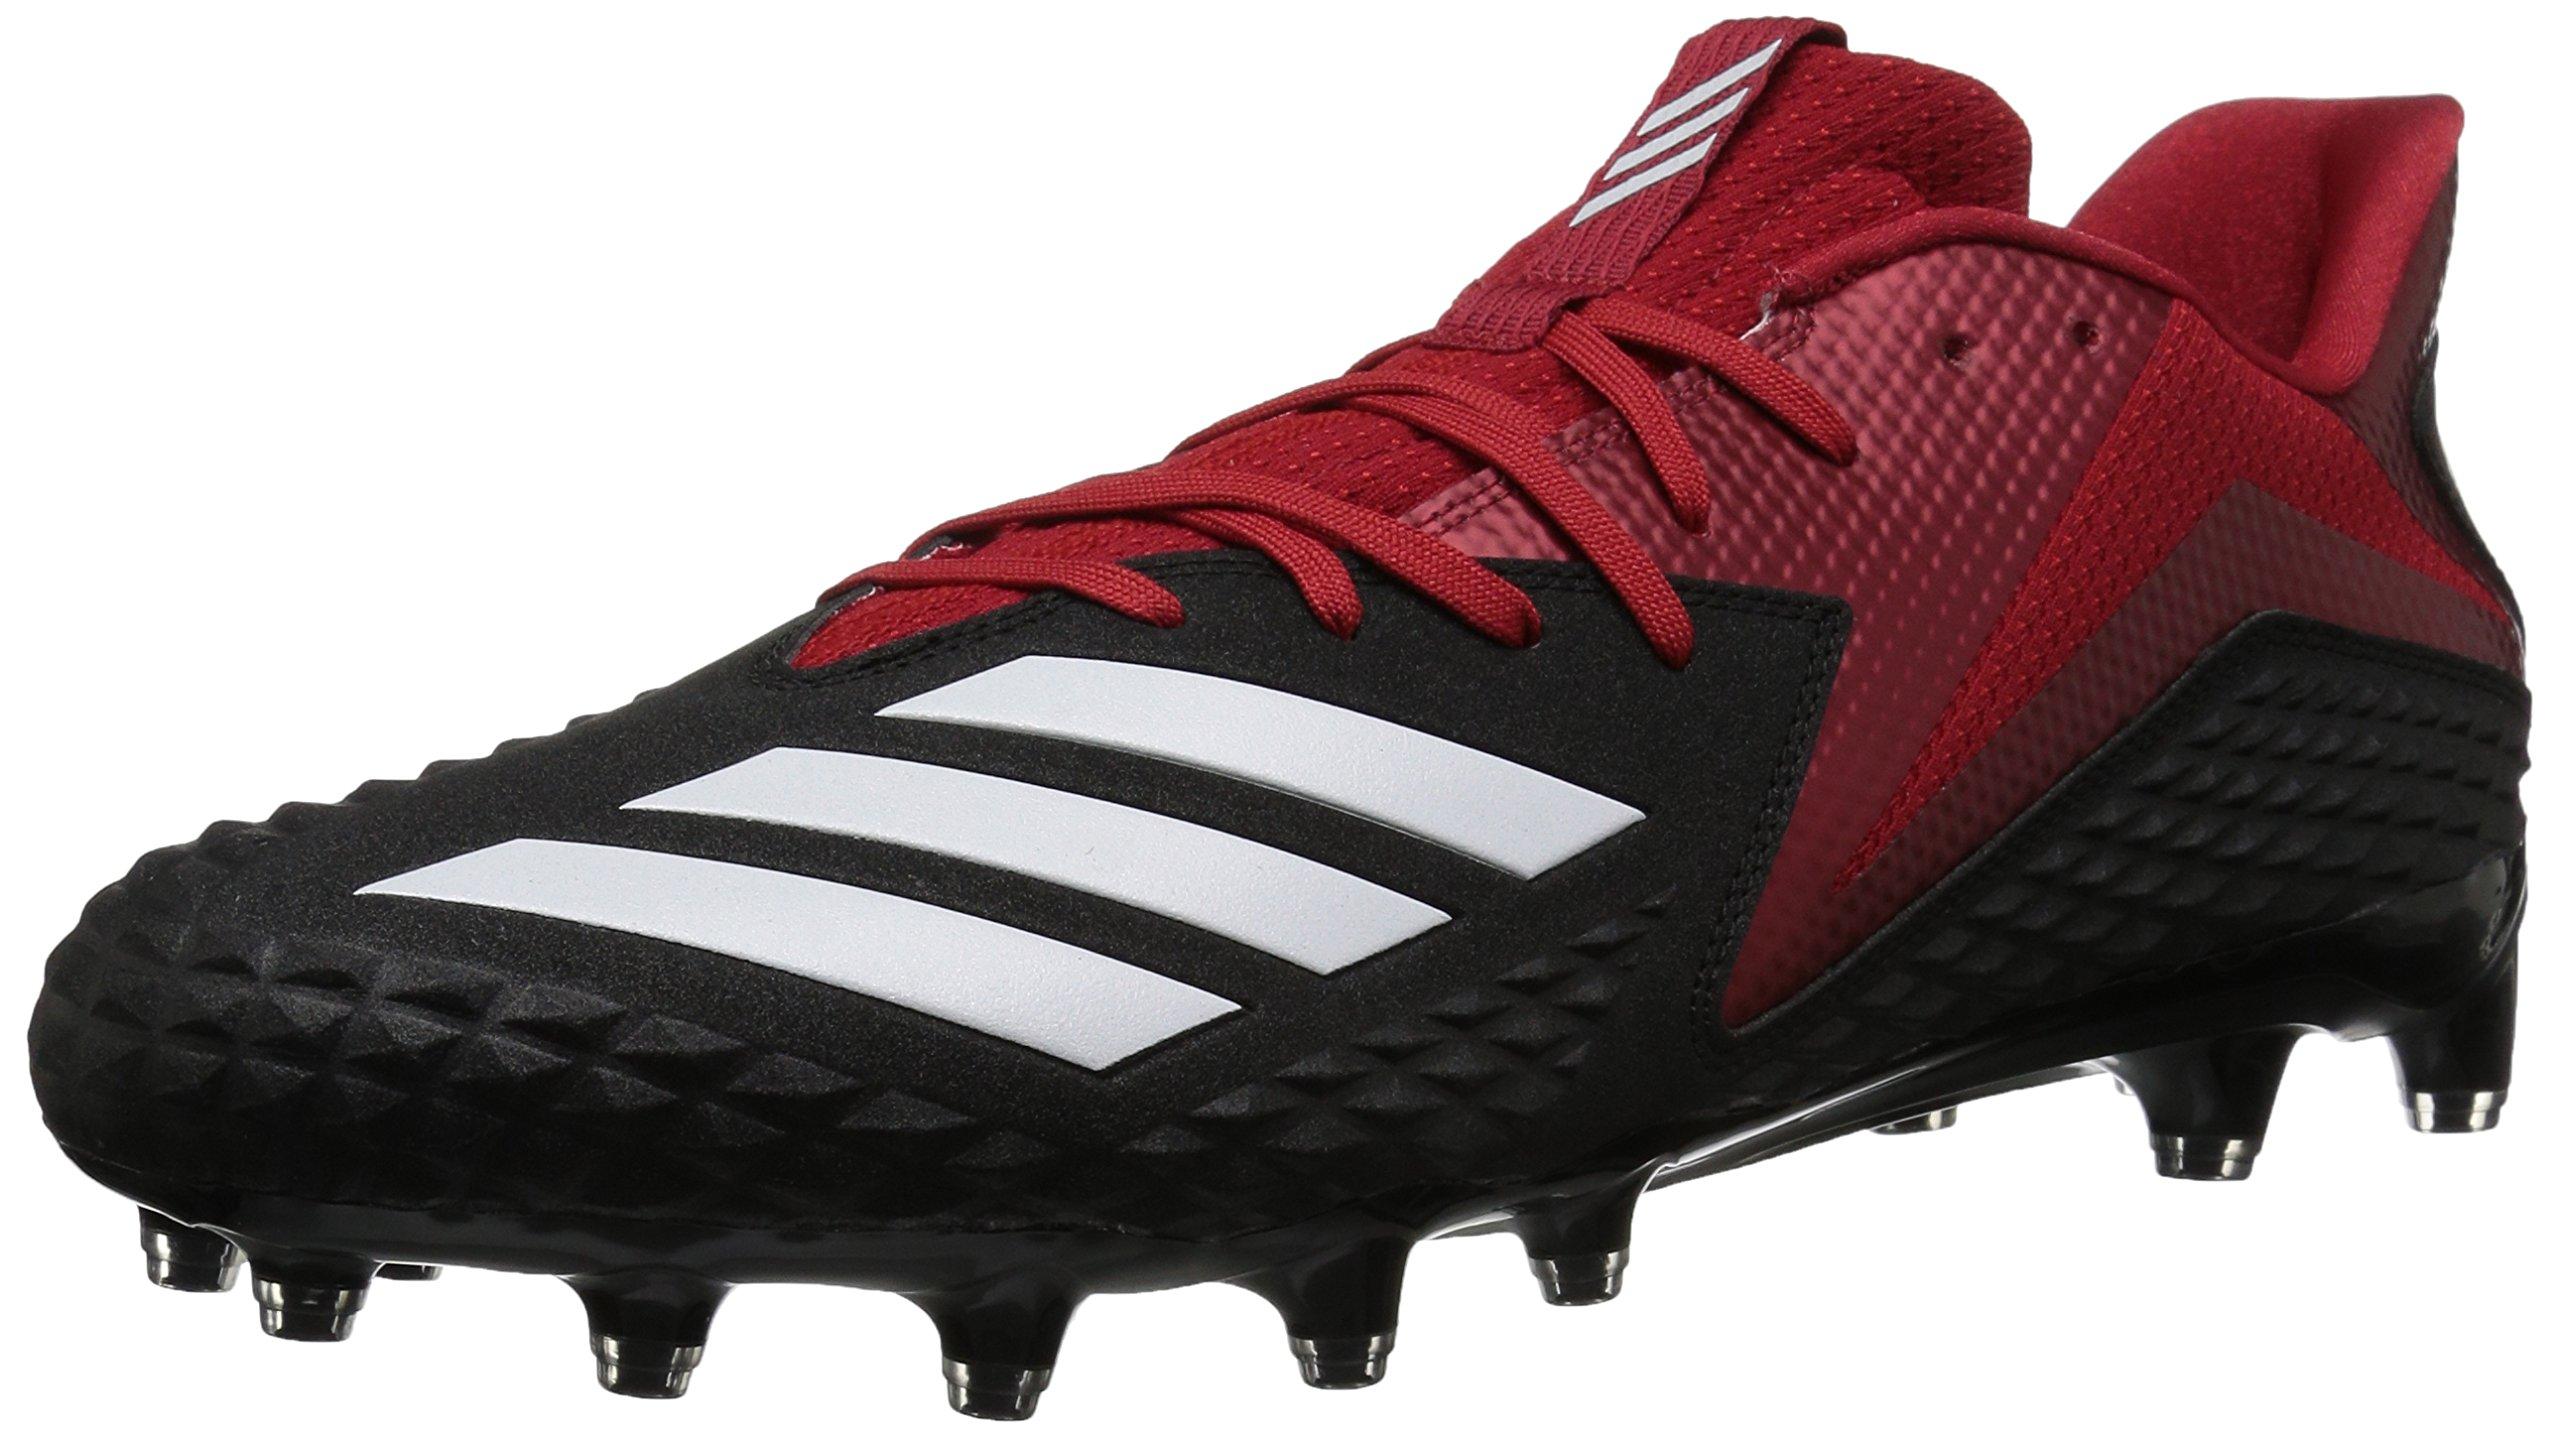 designer fashion 3bd19 475b7 Galleon - Adidas Mens Freak X Carbon Mid Football Shoe, BlackWhitePower  Red, 17 M US